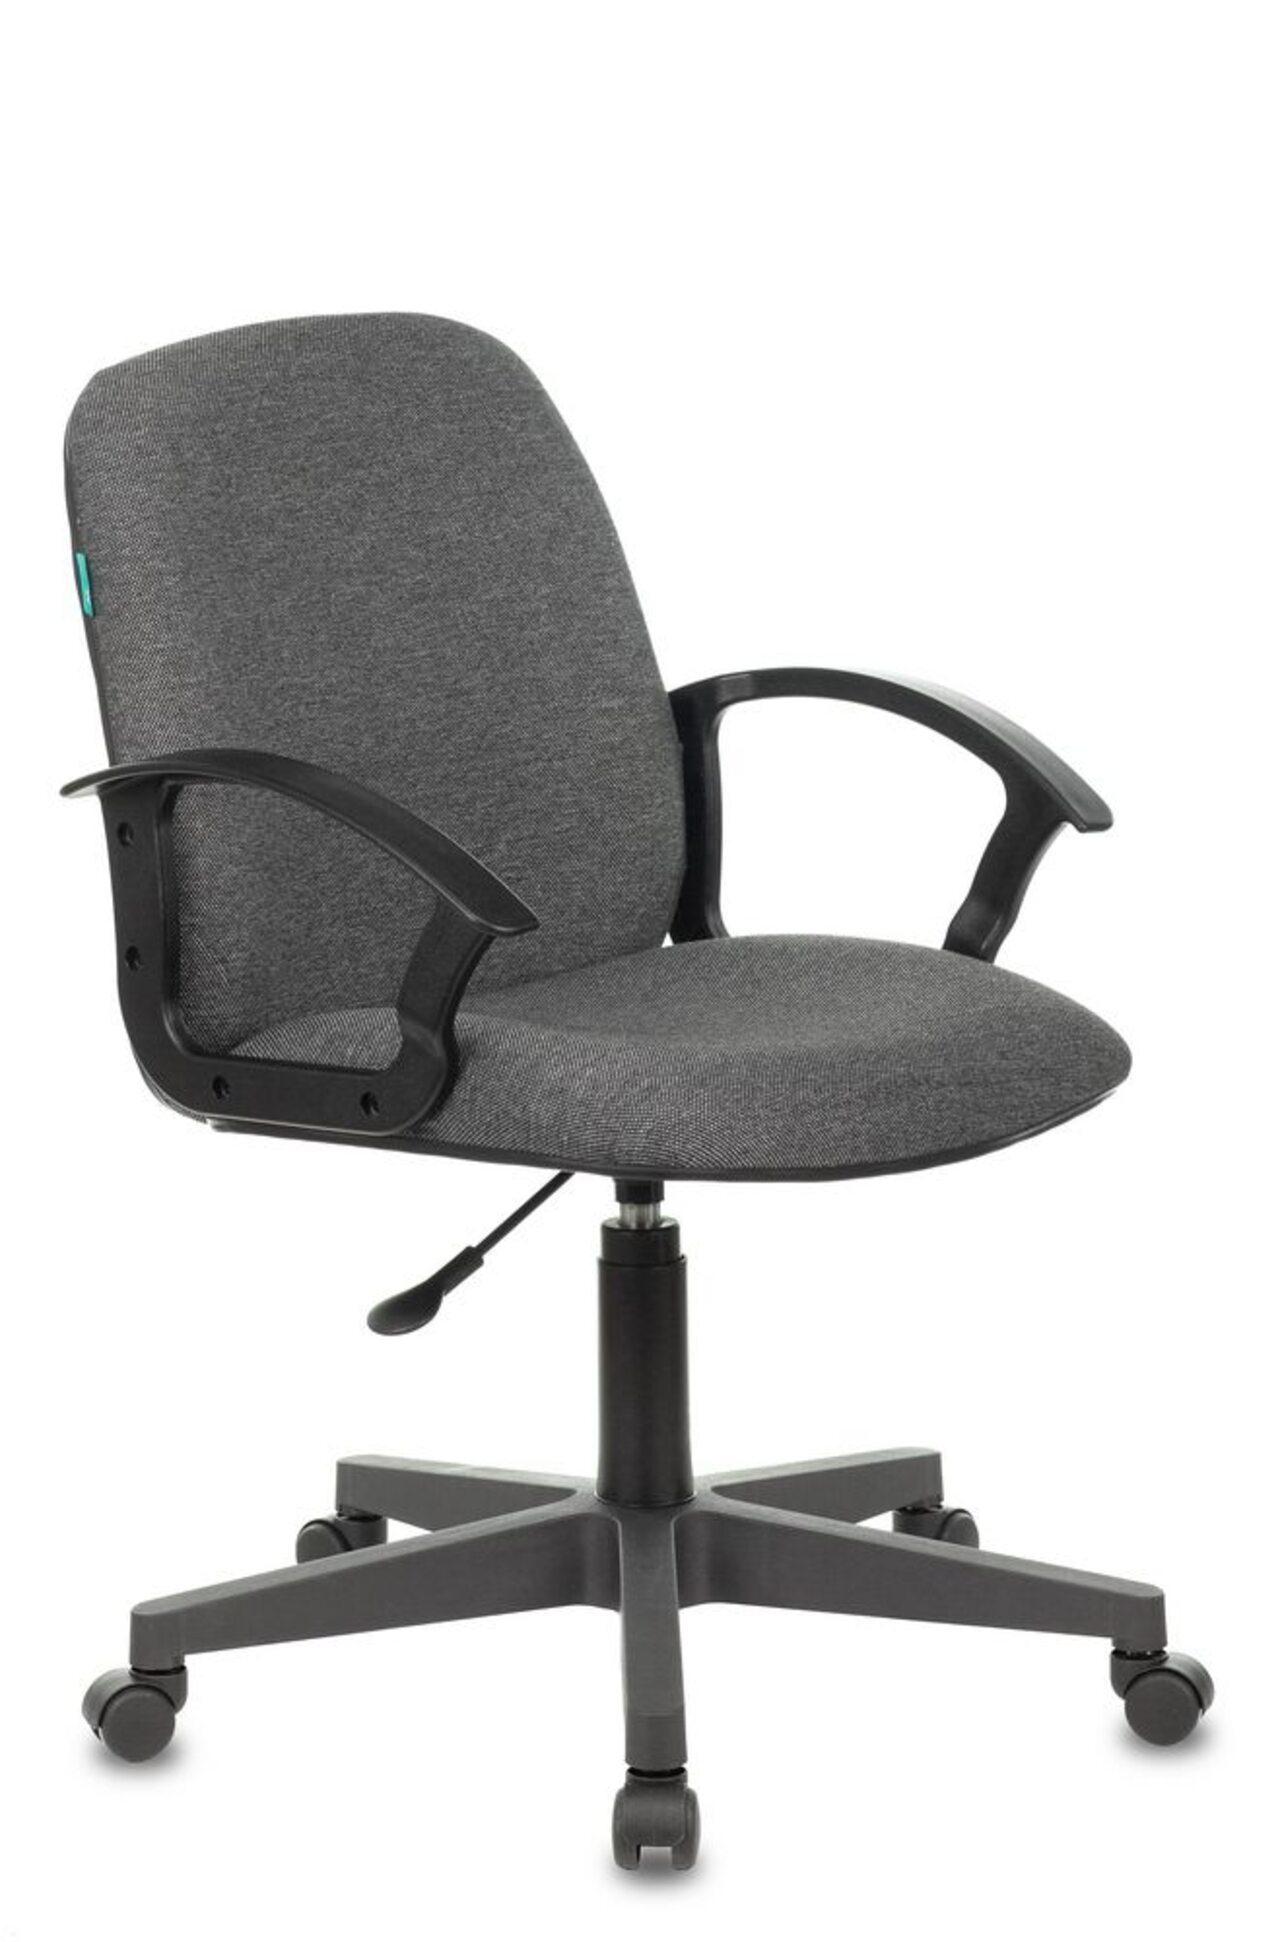 Кресло для персонала CH-808-LOW - фото 7